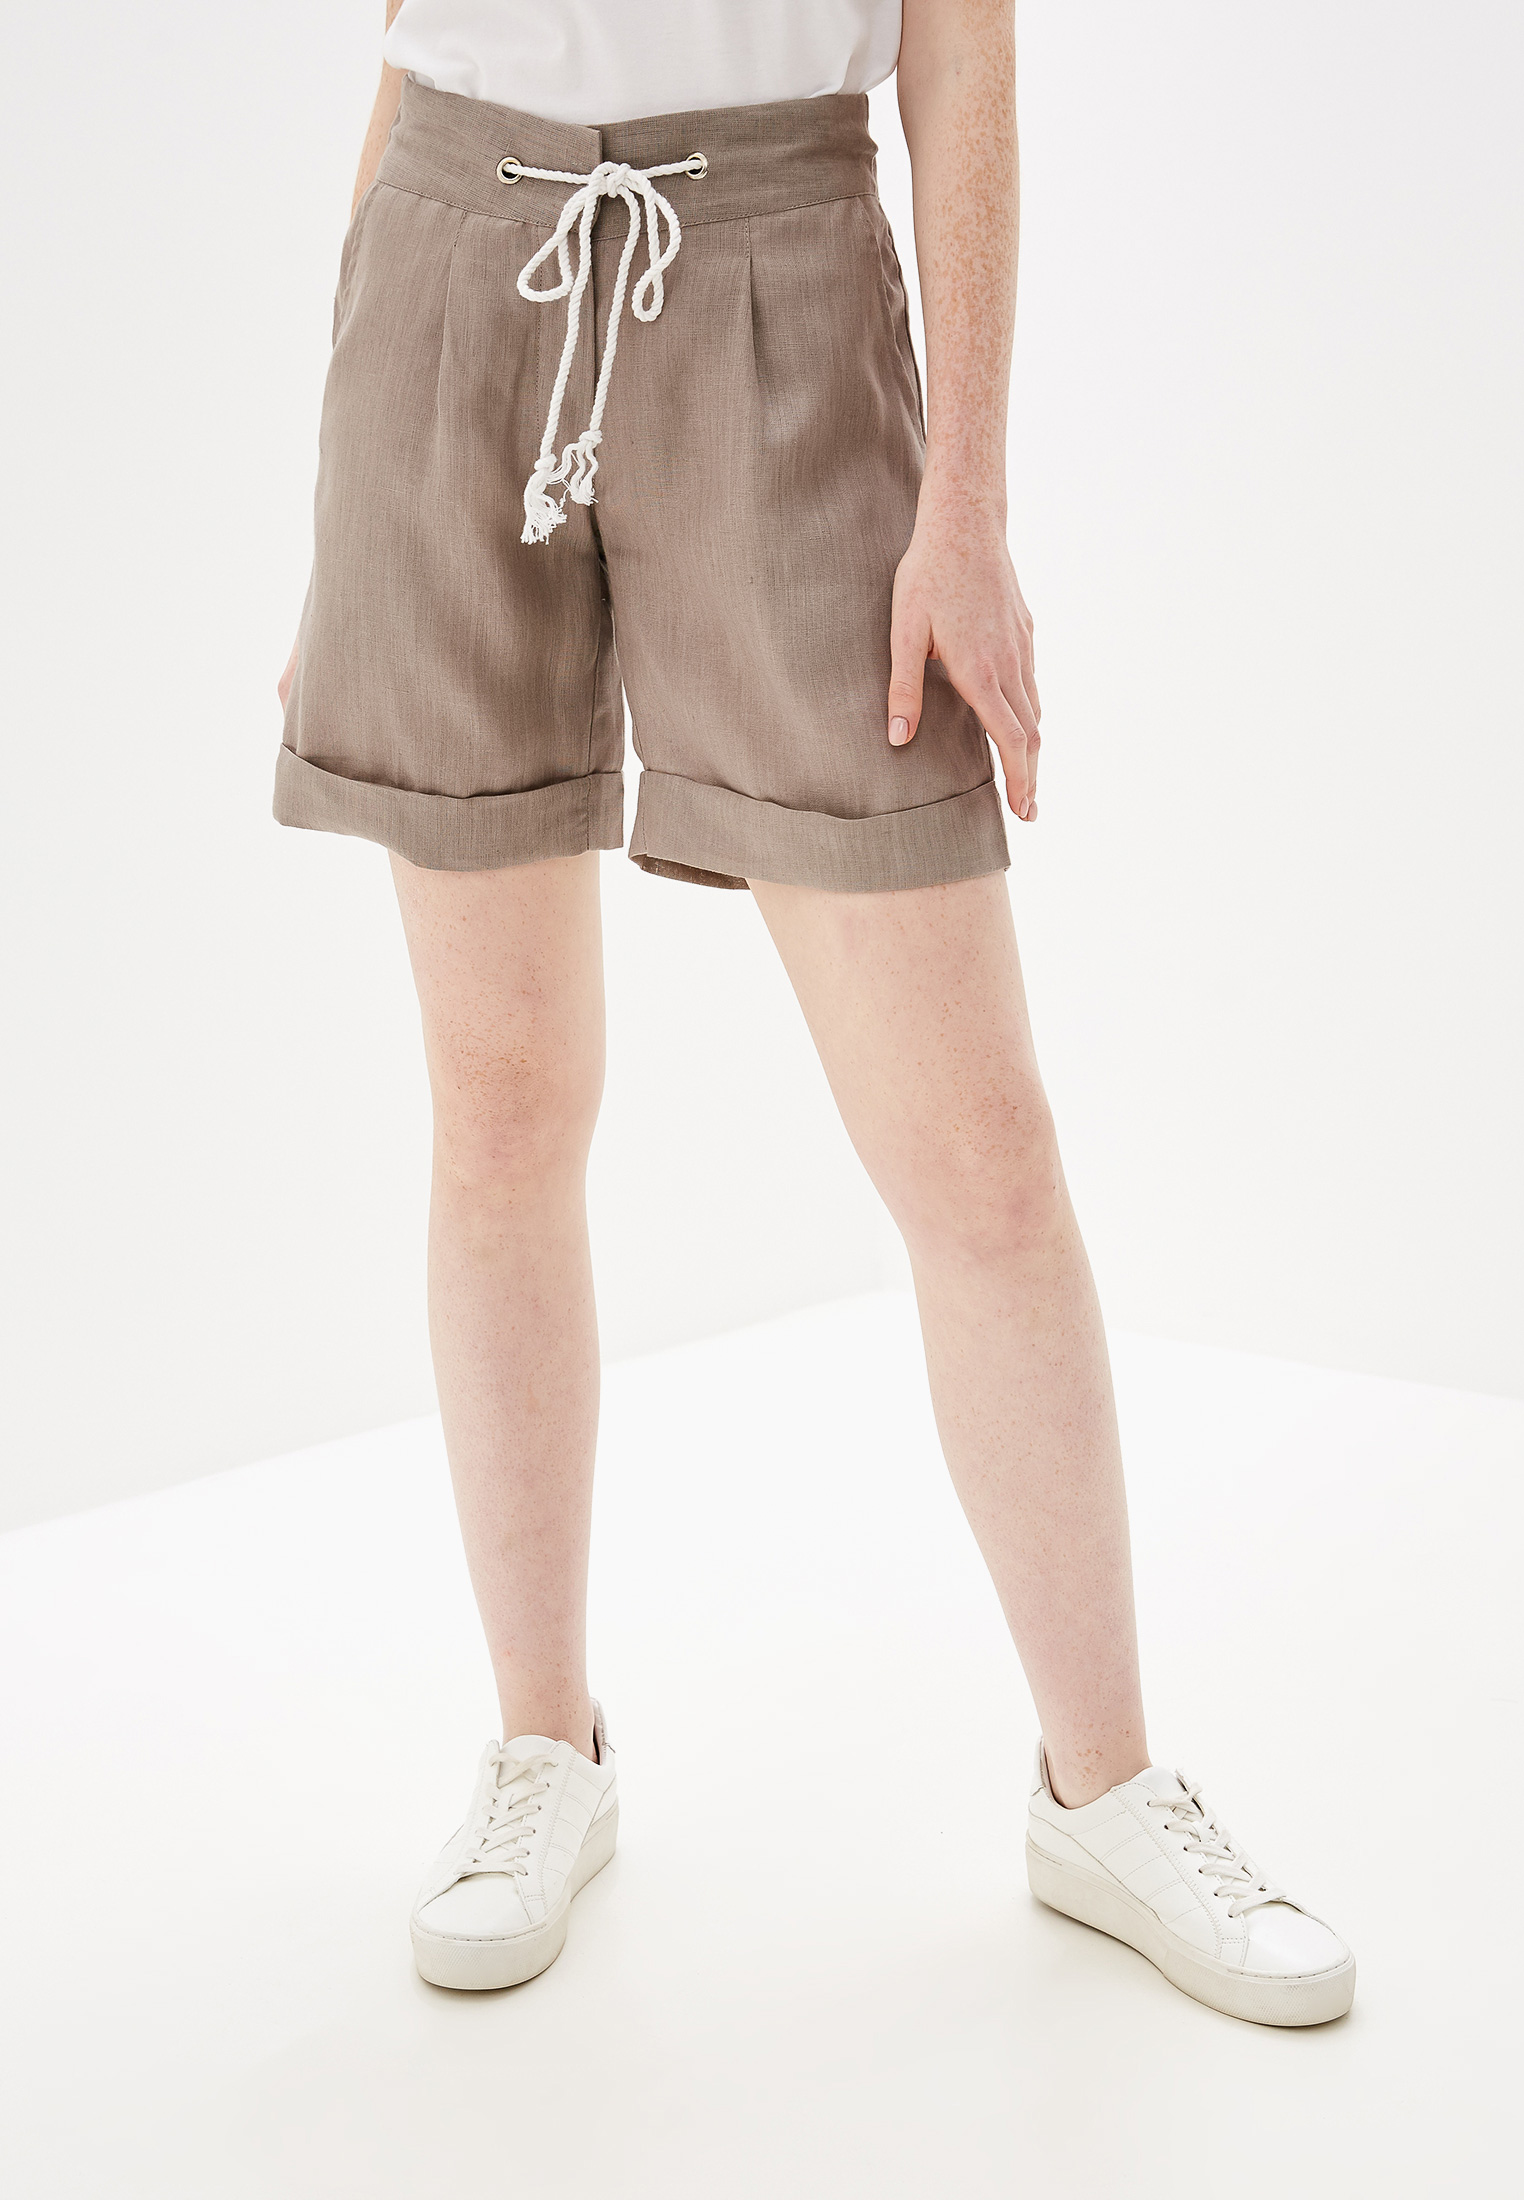 Женские повседневные шорты Glenfield W92PN403F-40